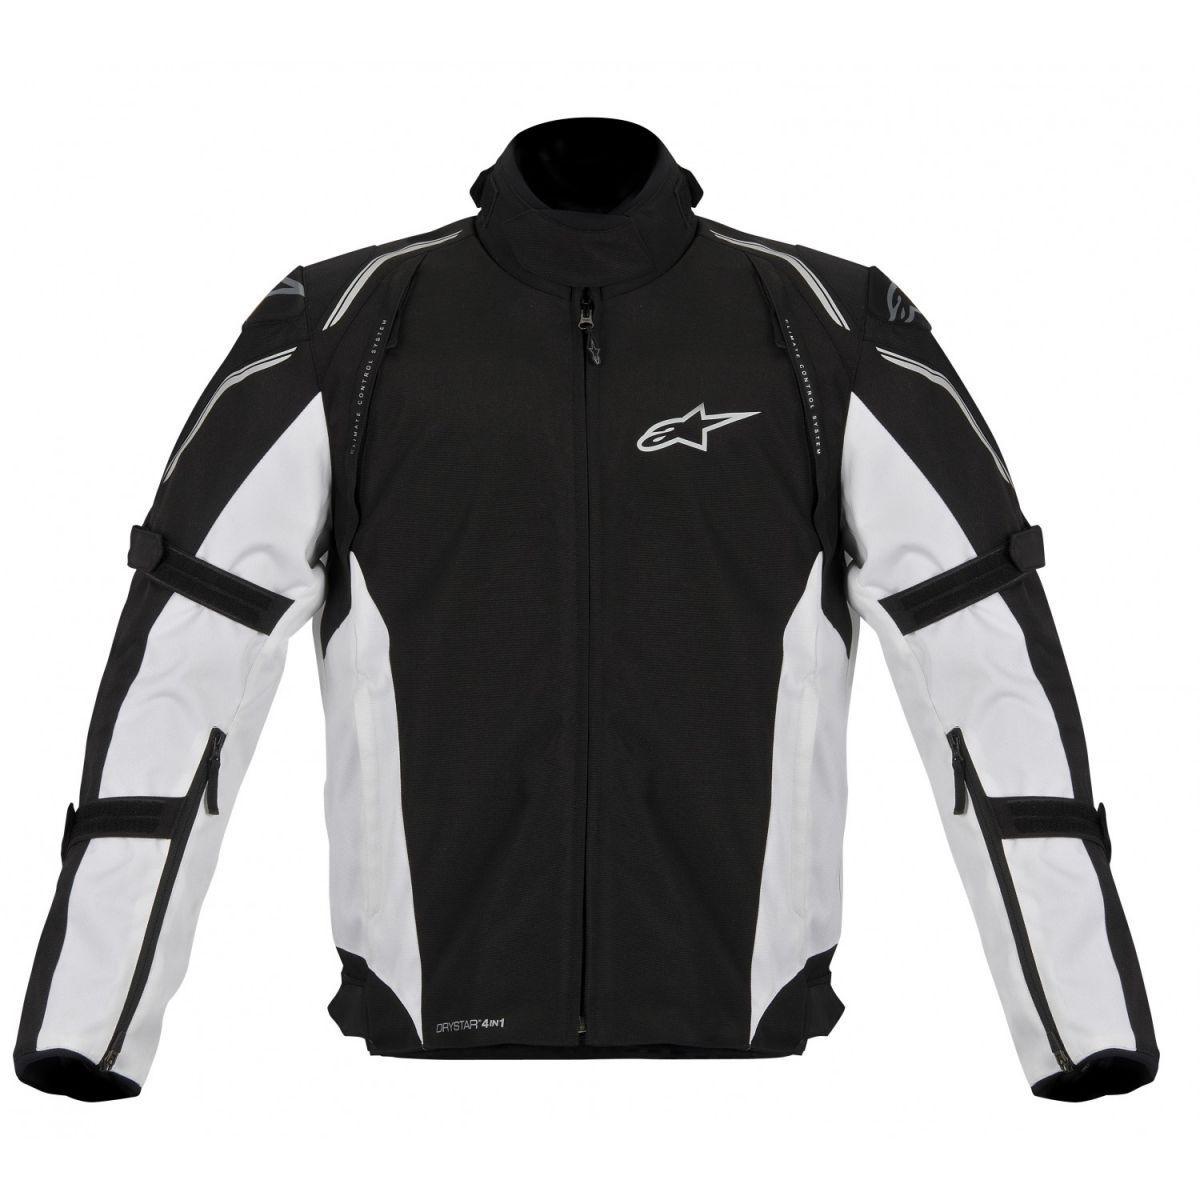 Jaqueta Alpinestars Megaton DRYSTAR® WP (BlackWhite/ 4 em 1)  - Super Bike - Loja Oficial Alpinestars